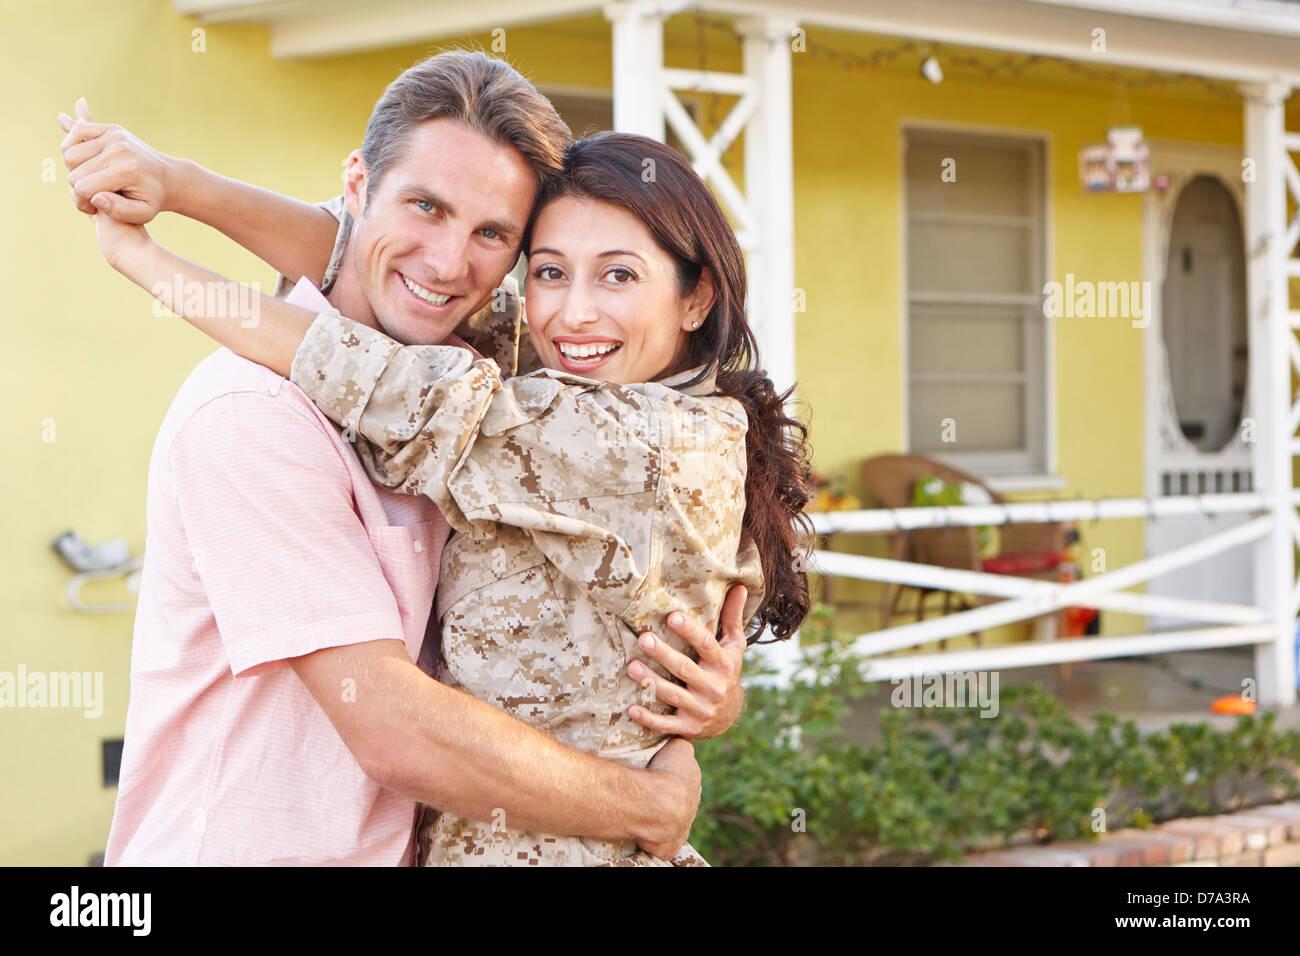 Mann, die Frau Zuhause Armee beurlaubt begrüßen Stockbild